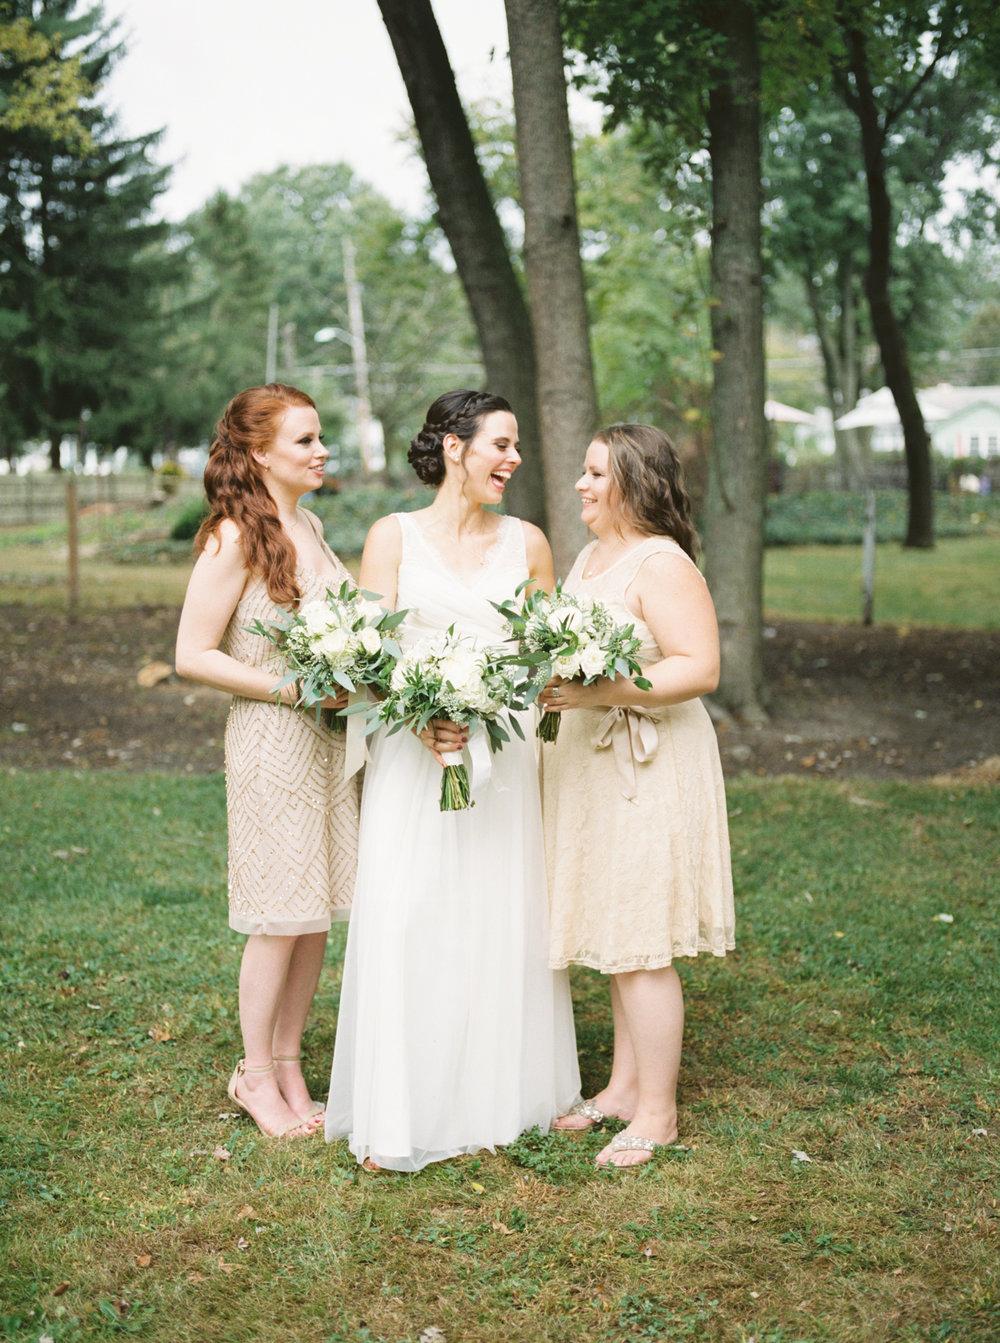 haley-richter-photography-new-jersey-backyard-wedding-208.jpg